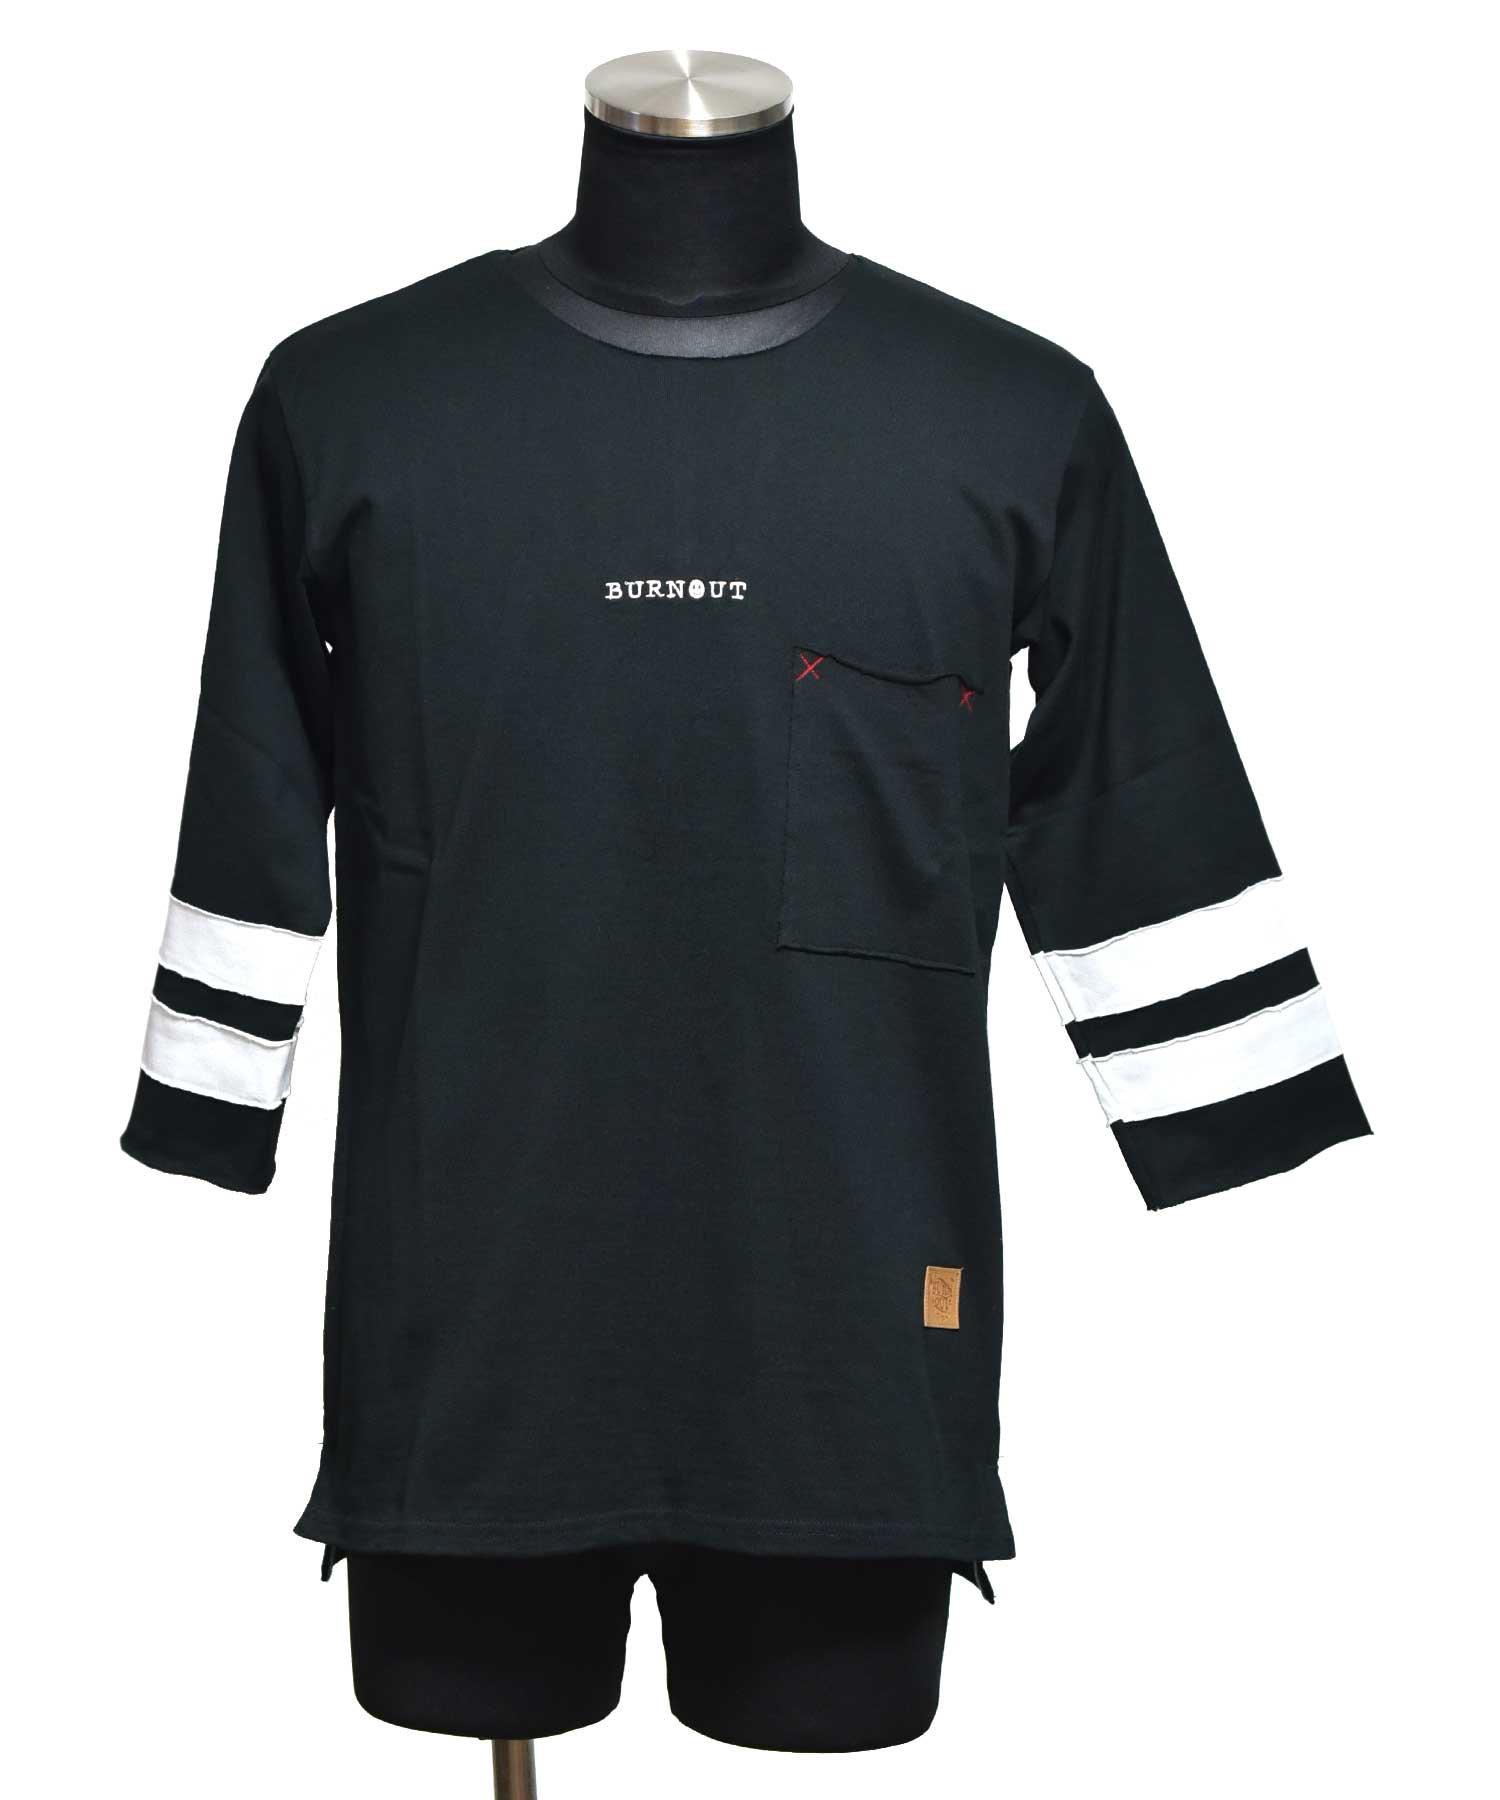 BURNOUT(バーンアウト )ポケット付き 4/3スリーブ フットボール T / ブラック